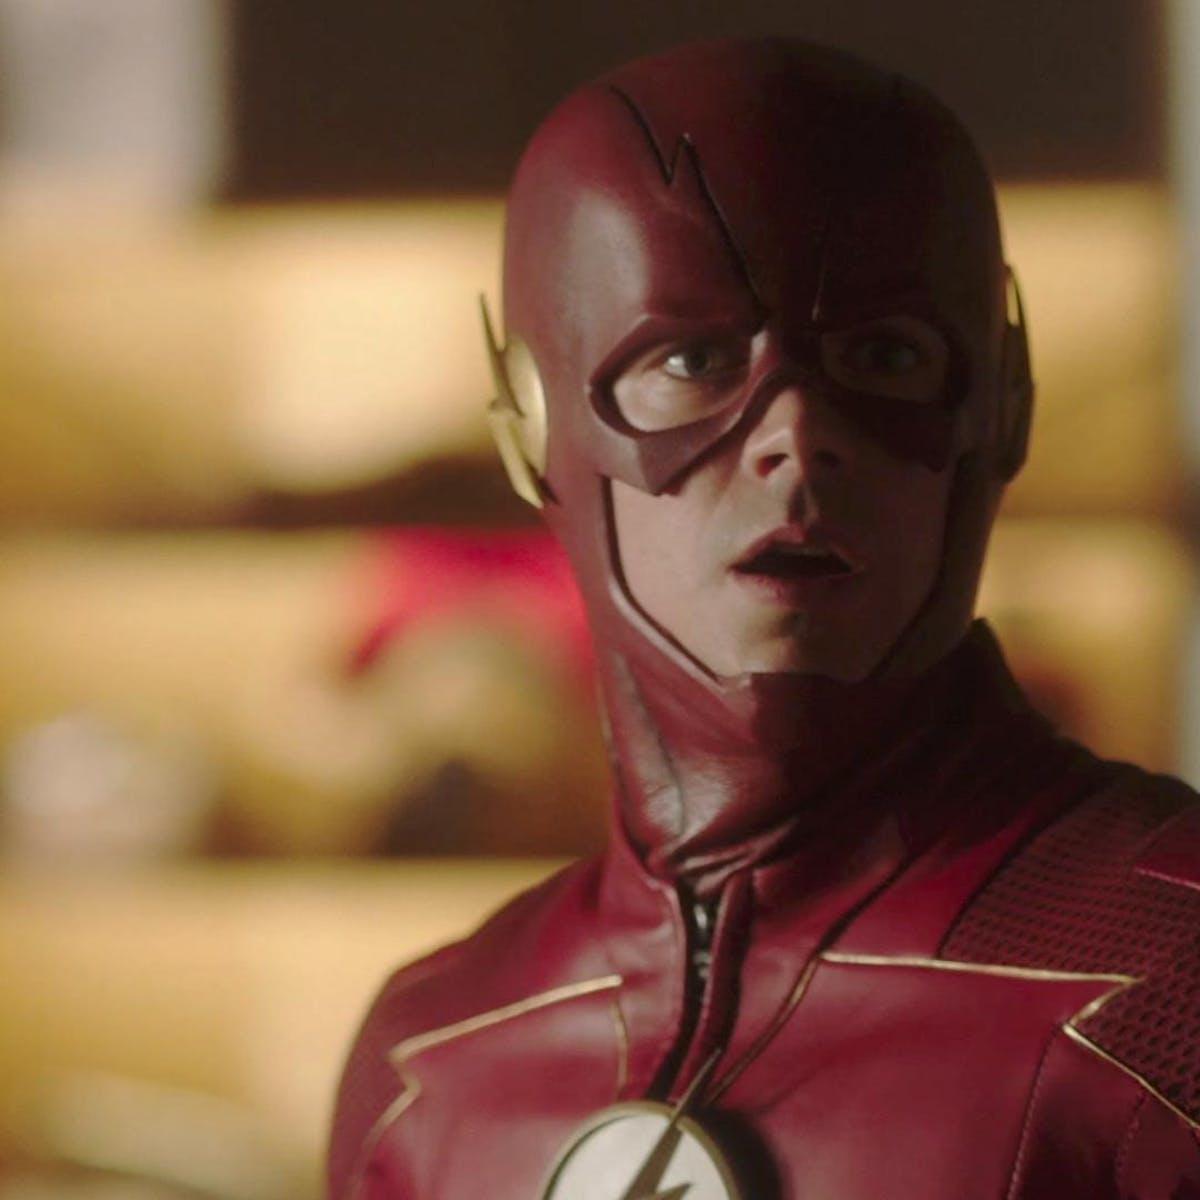 'The Flash' Episode Title Might Spoil a Badass New Villain